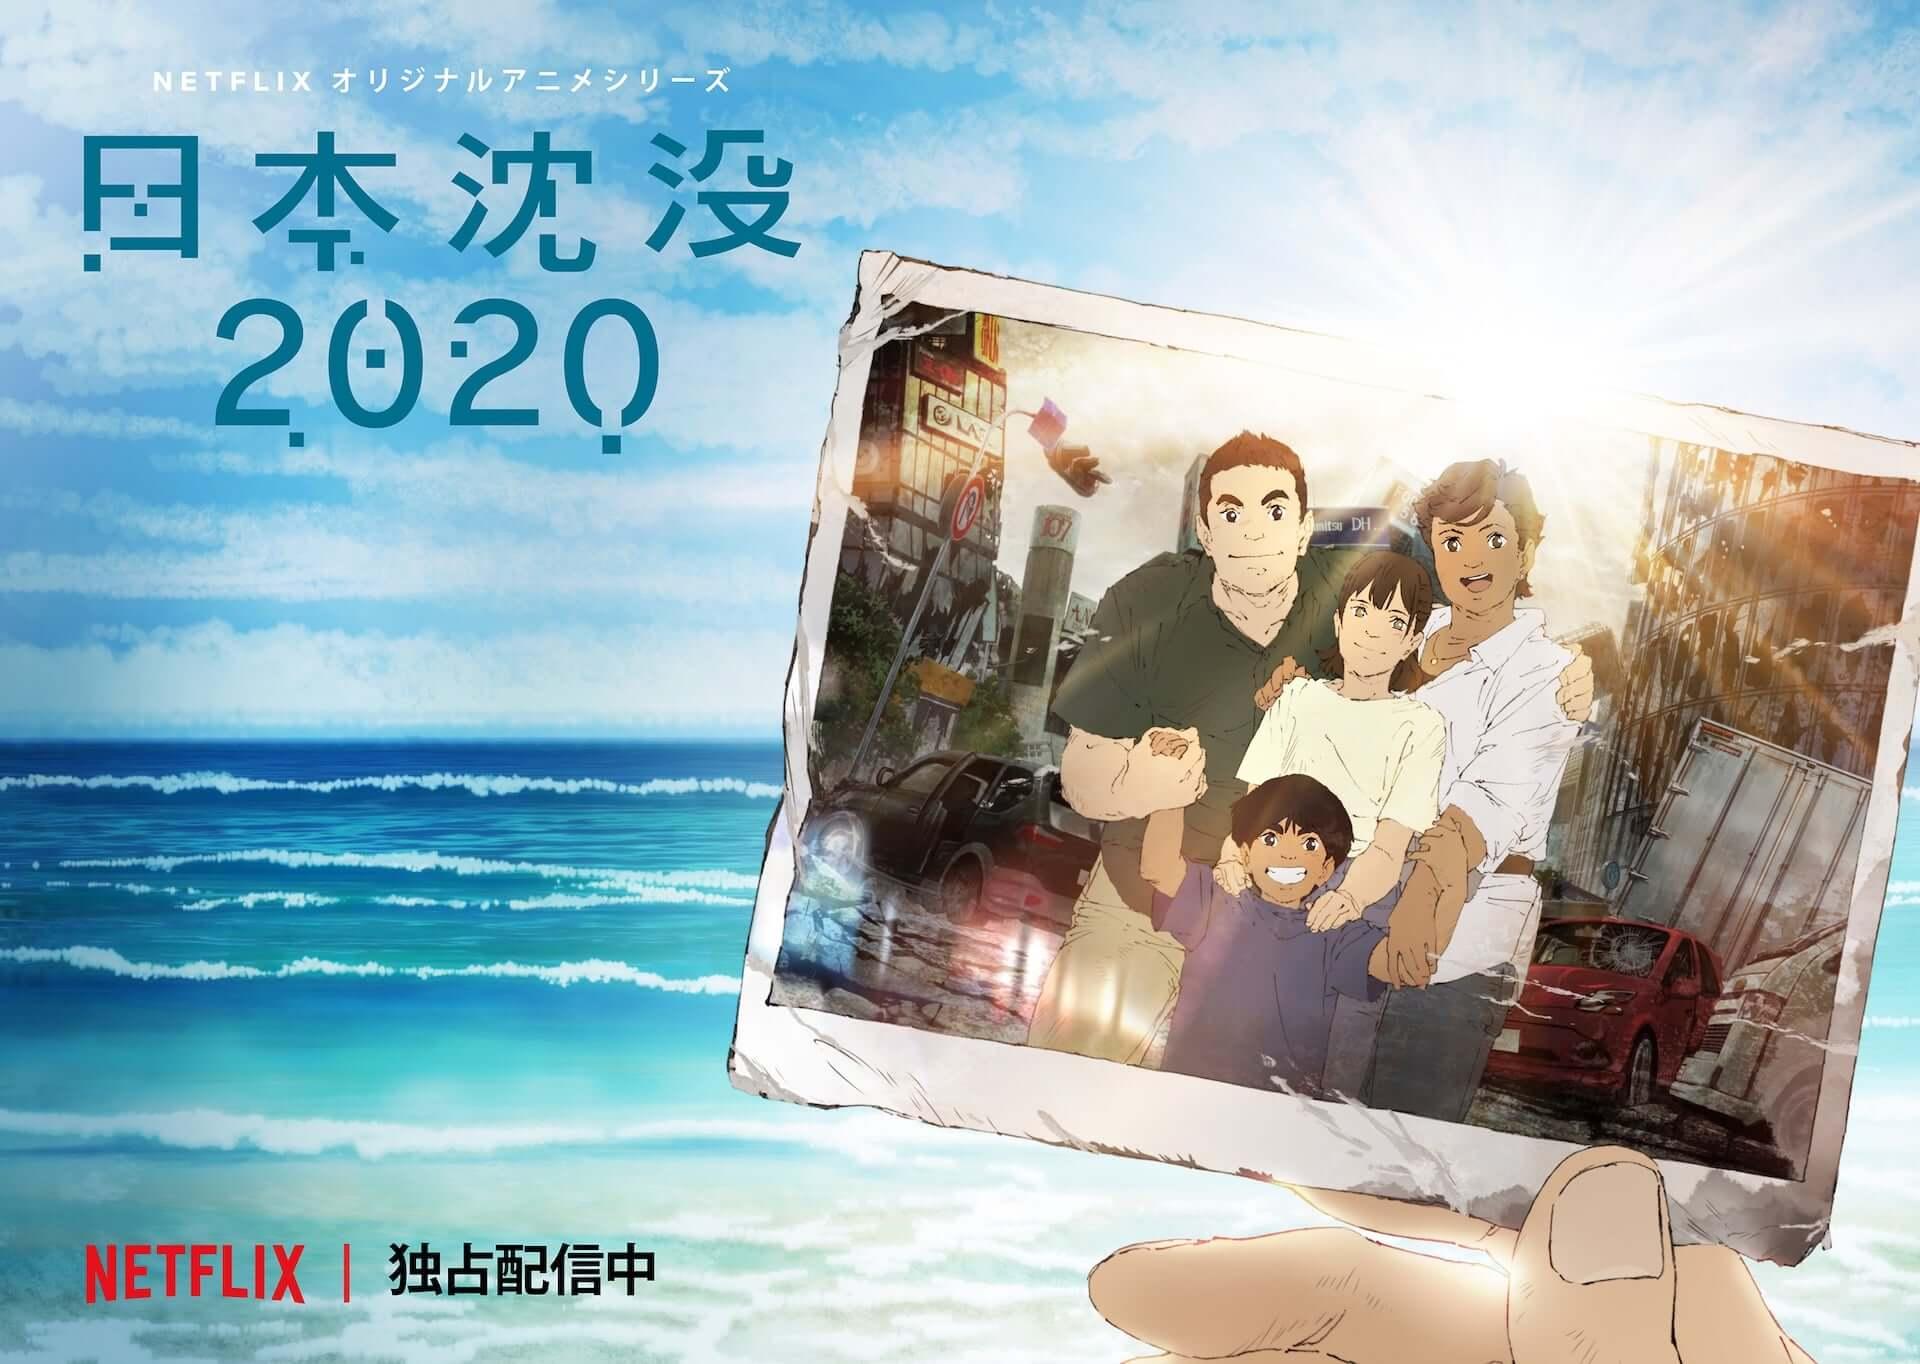 Netflix『日本沈没2020』のスピンオフ企画「シズマヌキボウ」が始動!向井太一、Daichi Yamamotoら参加のオリジナル曲が近日公開 art200710_japansinks_6-1920x1364